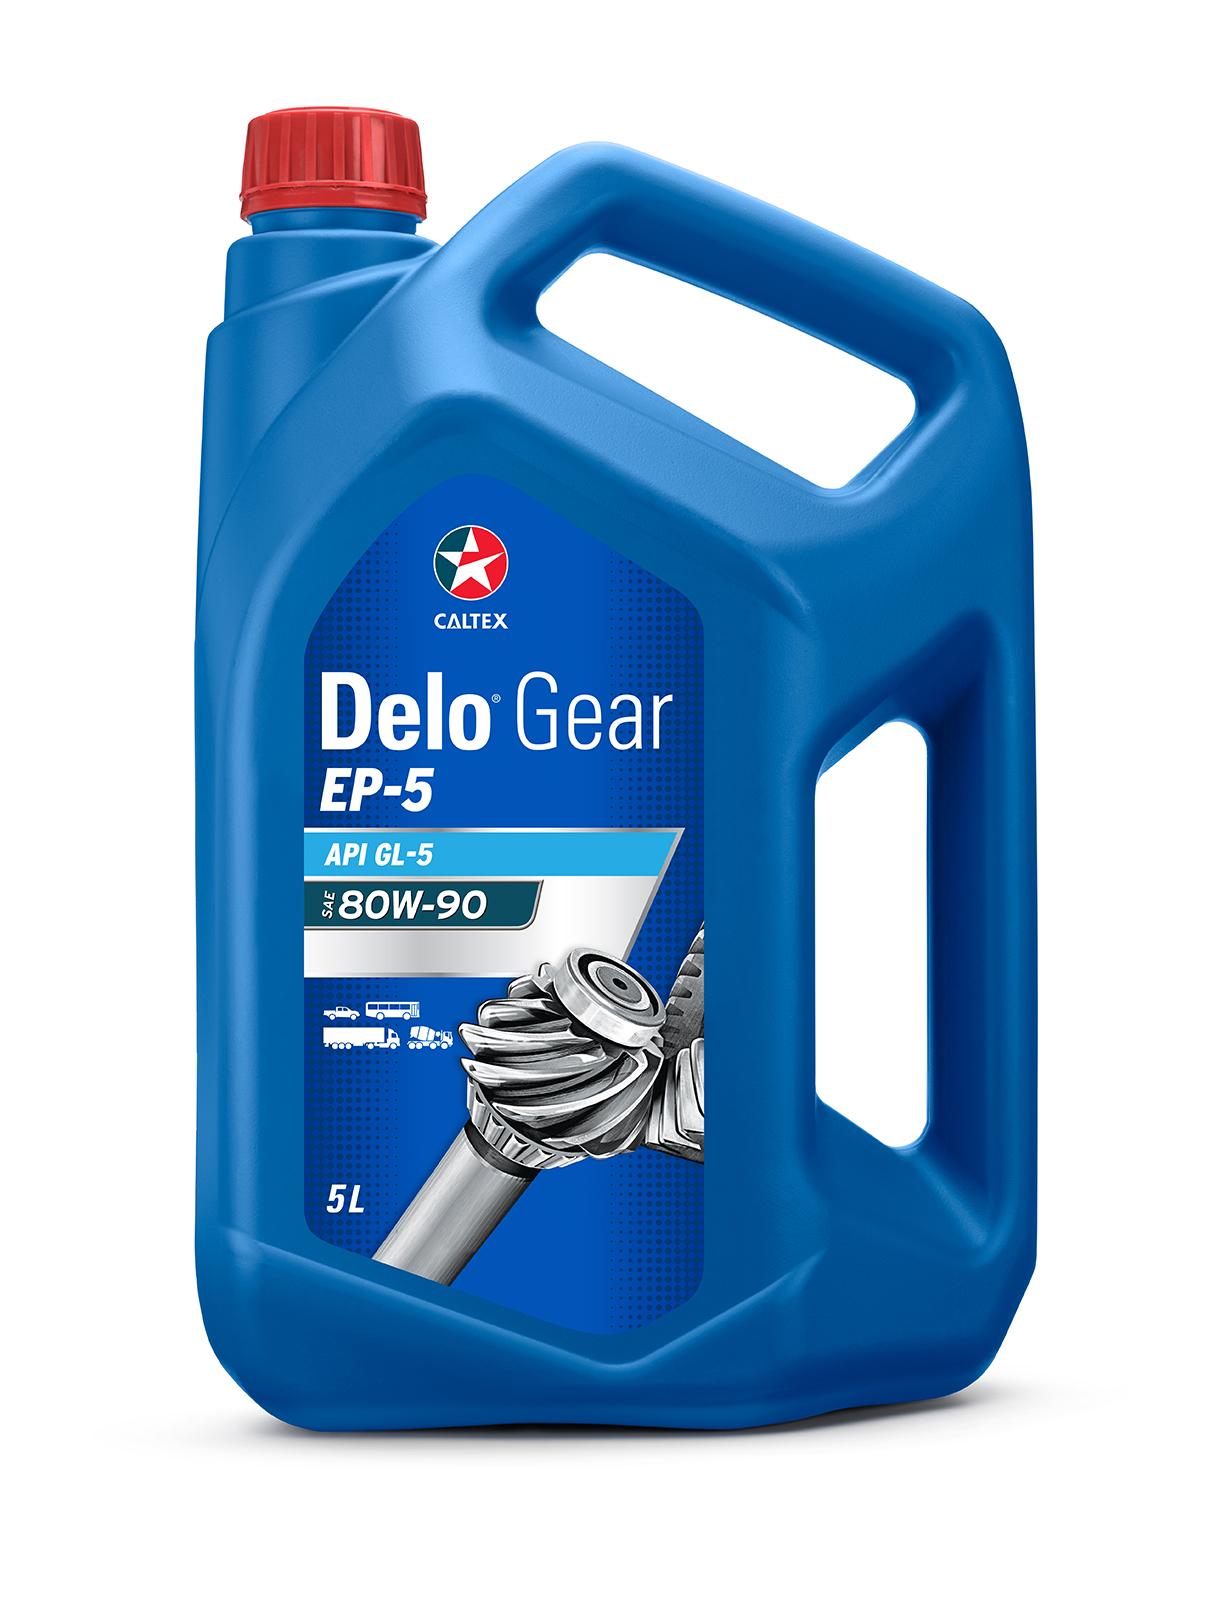 Gear Lubricants - Caltex South Africa